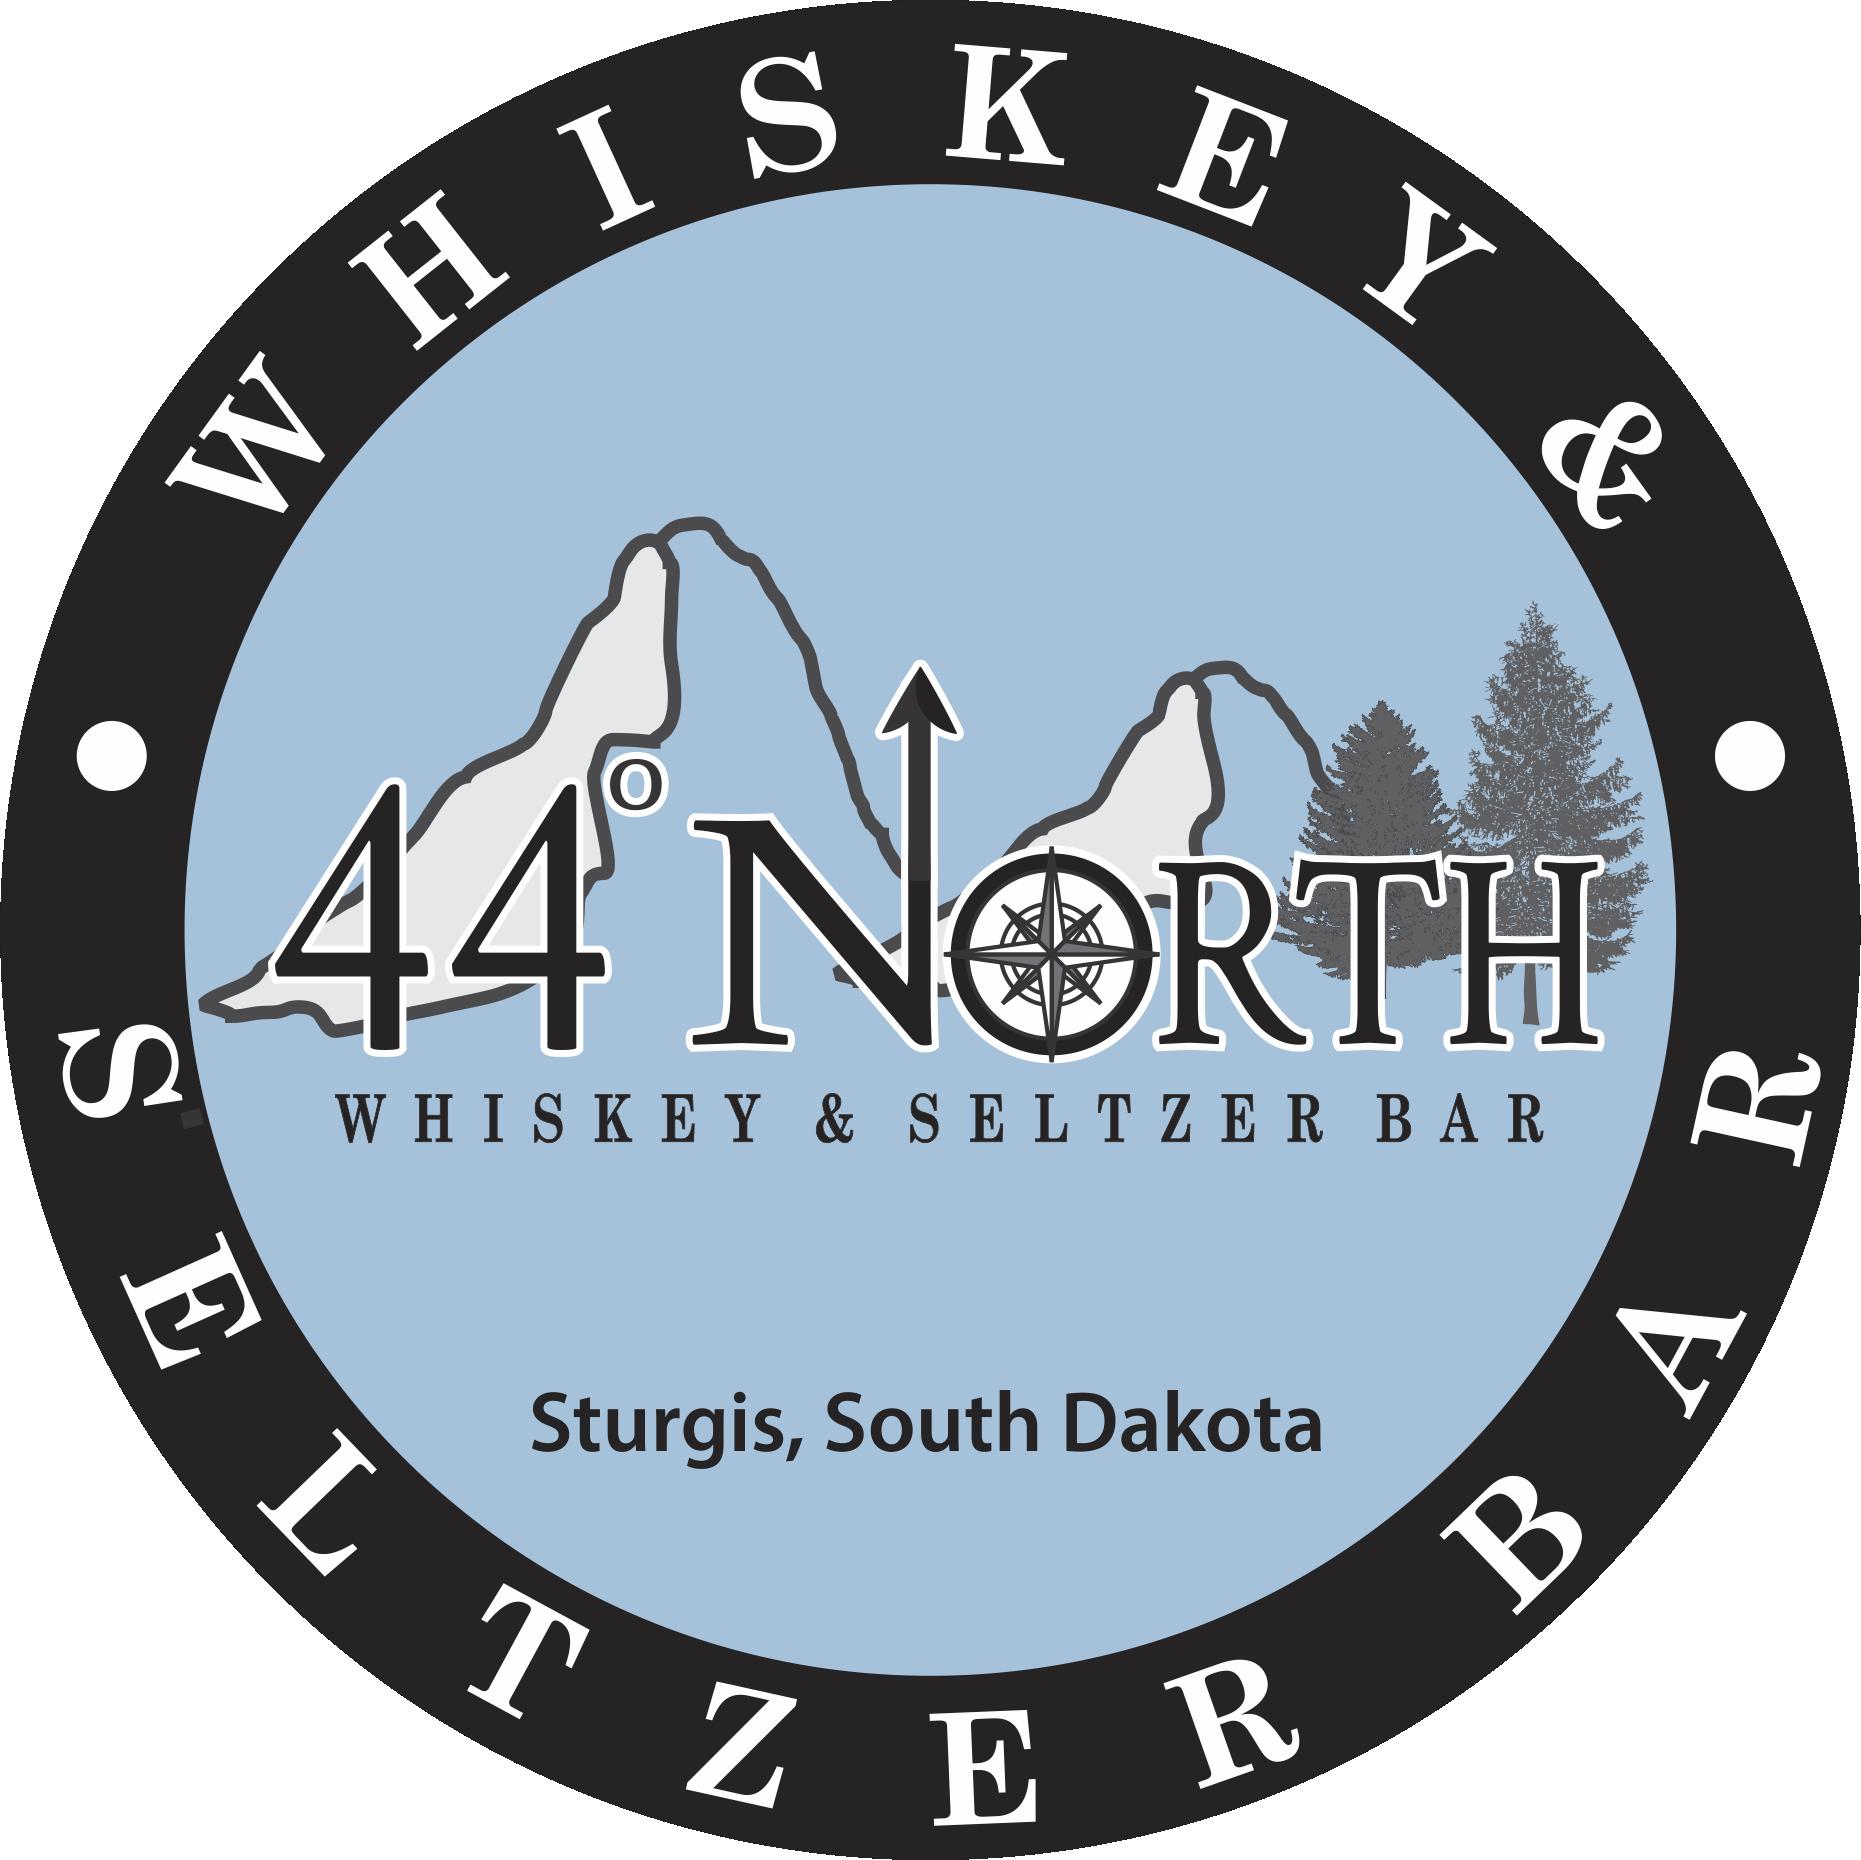 44° North Bar